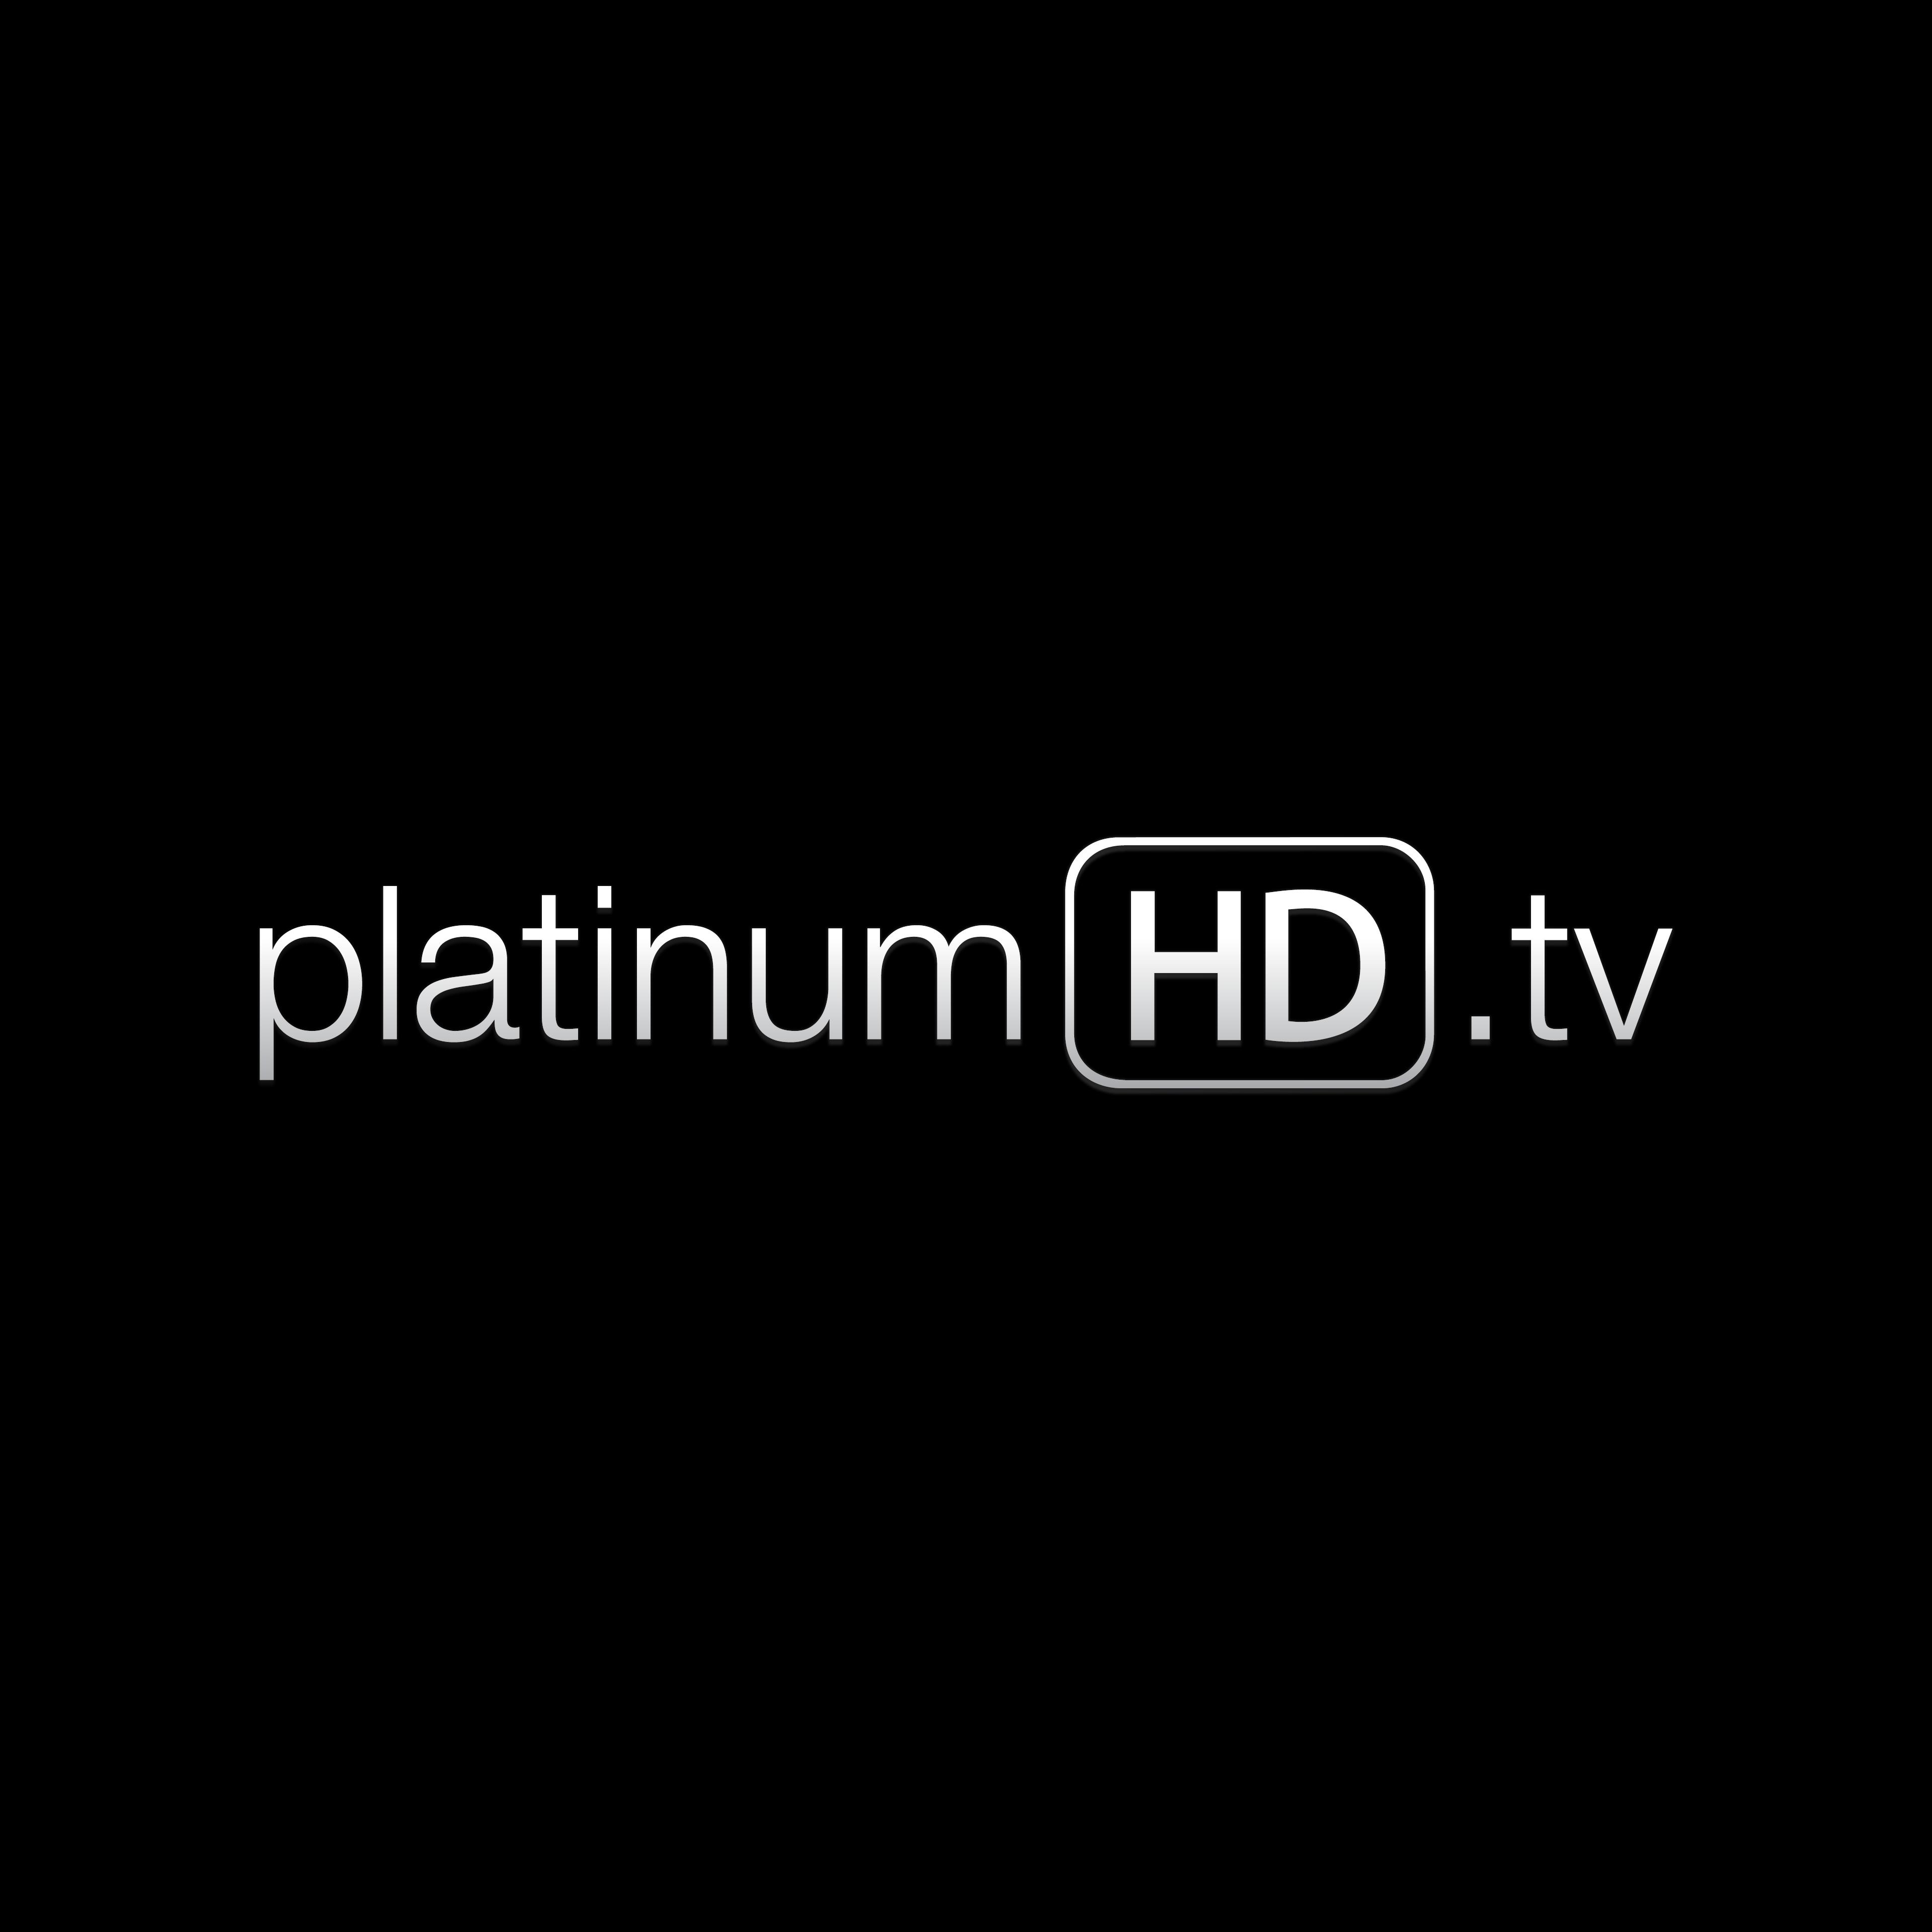 Avatar - platinumHD